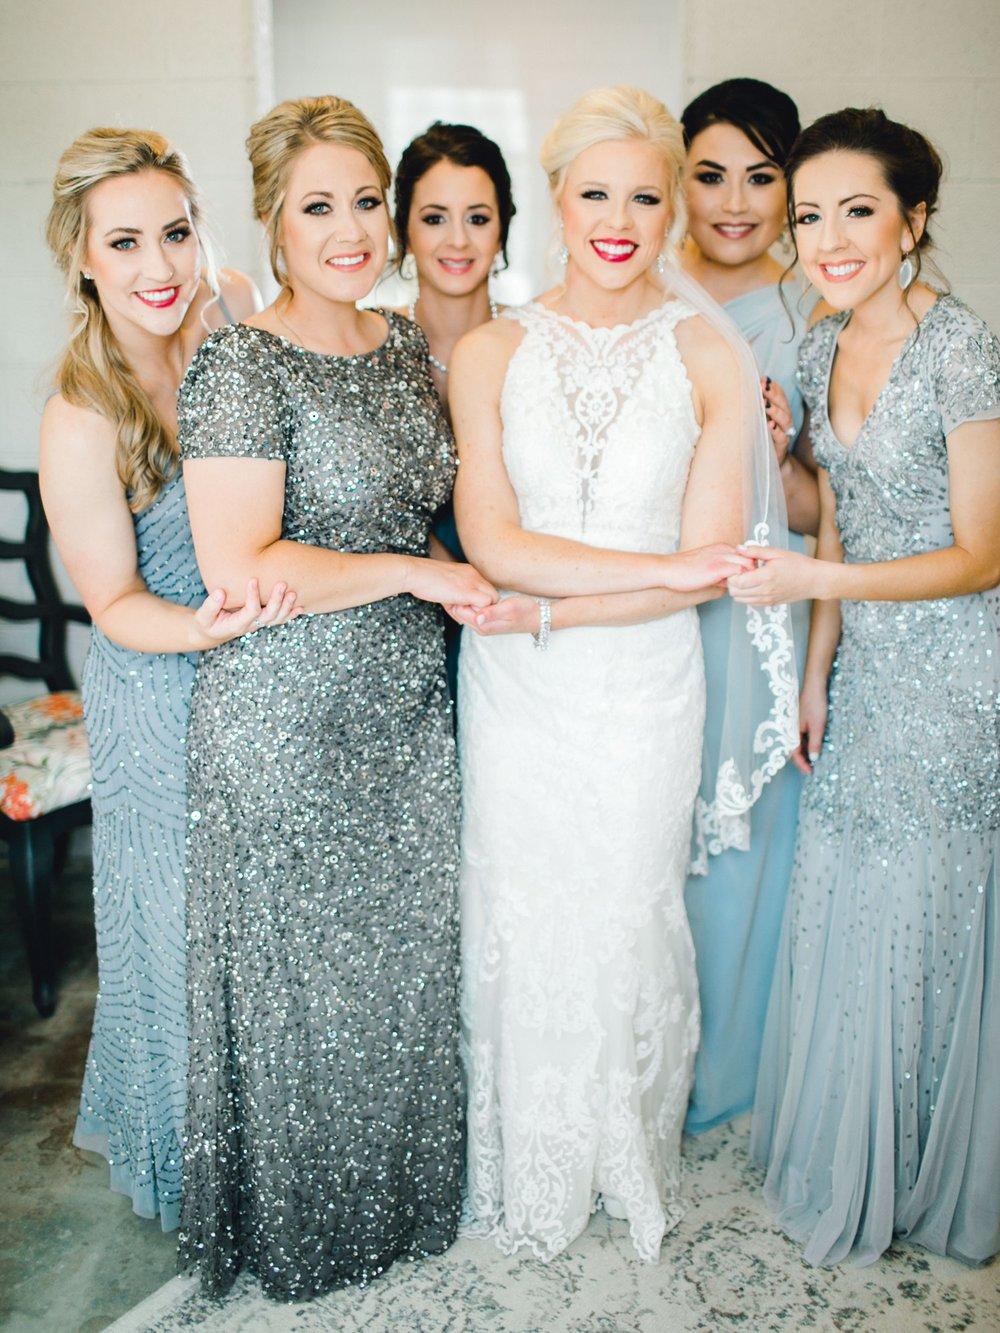 Jenna-and-garrett-Everett-kitalou-gin-lubbock-wedding-dayspring-designs-lubbock-wedding-photographer_0039.jpg